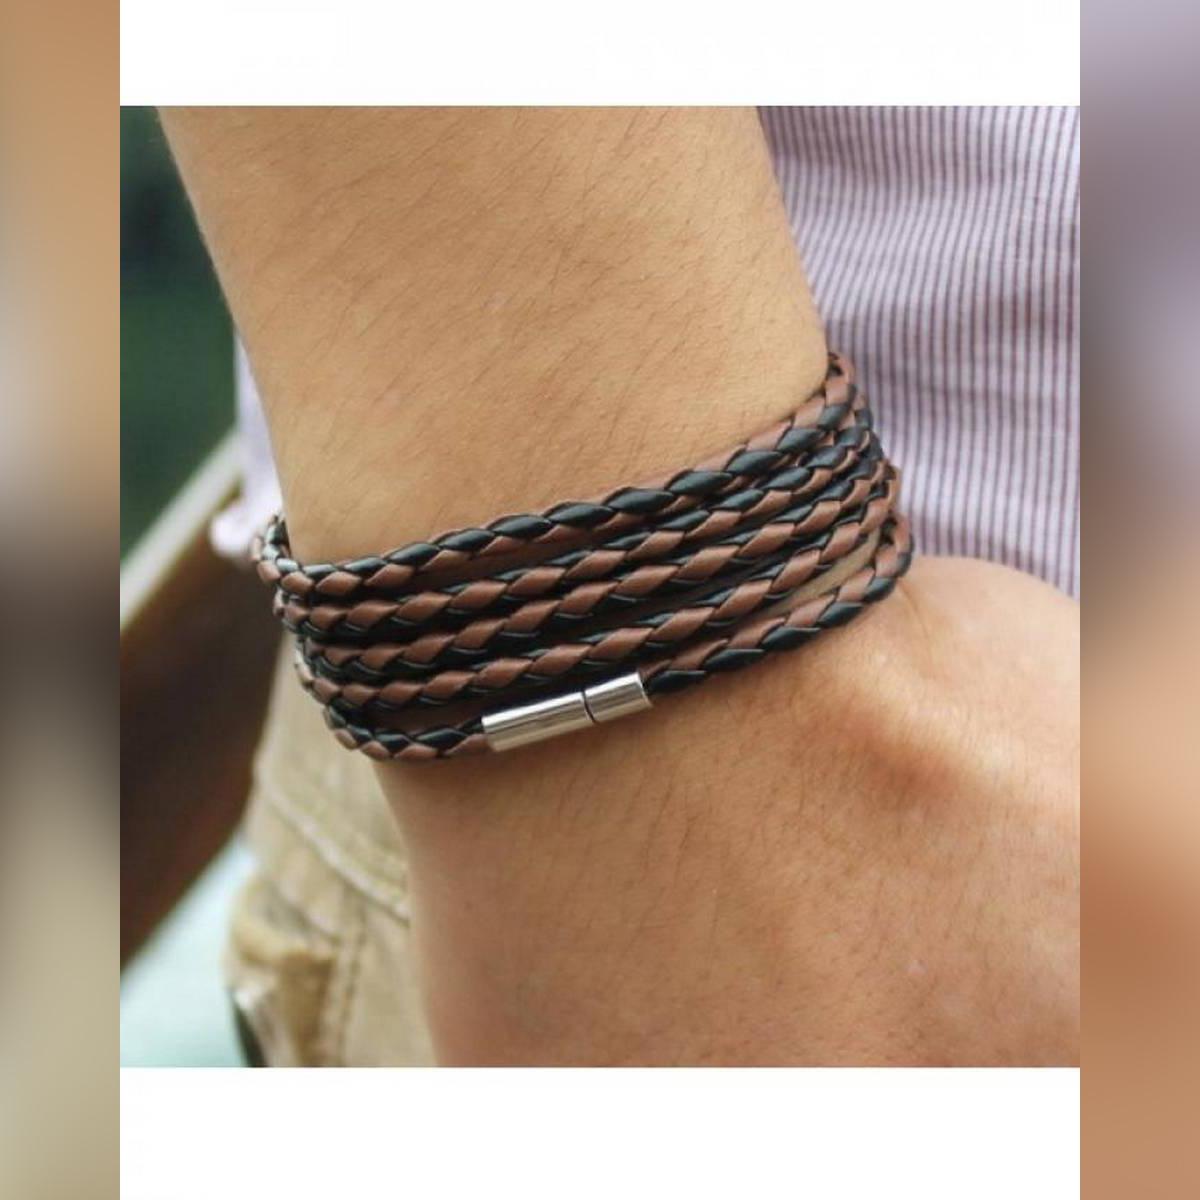 Black & Brown PU Leather Rolo Chain Bracelet - TM-Mb-16